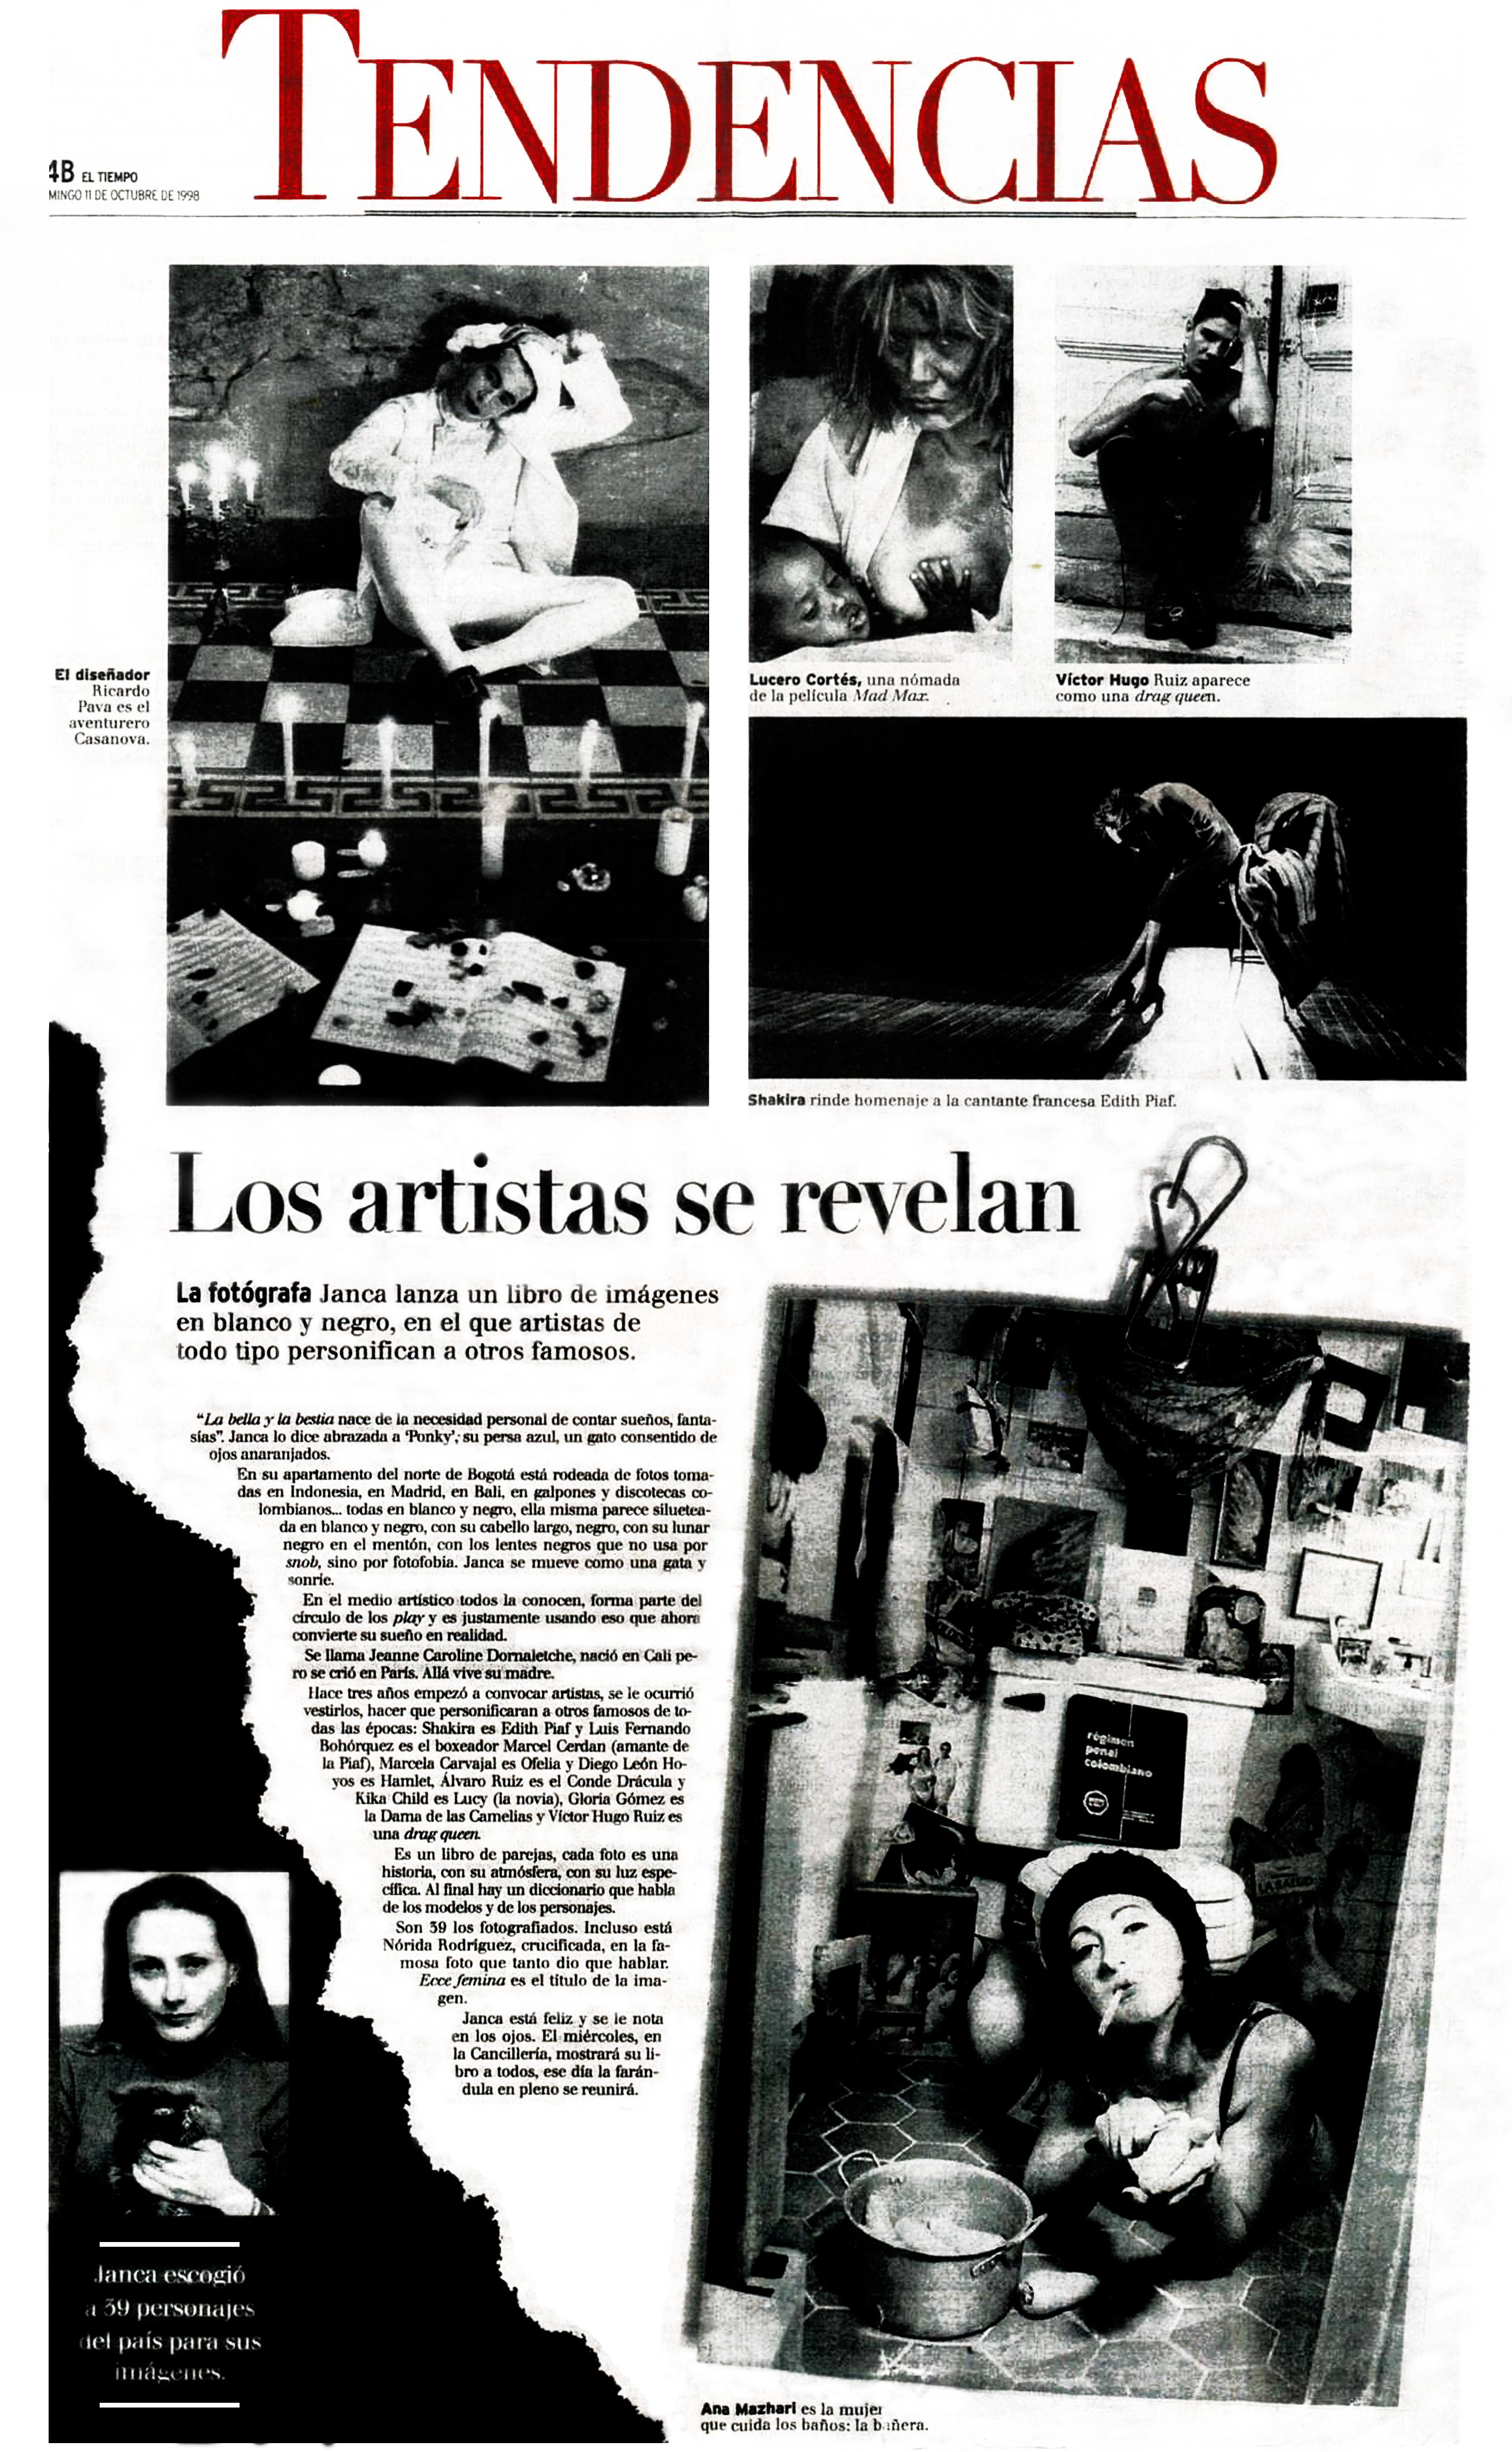 1998- BGTA - EL TIEMPO  full page.jpg